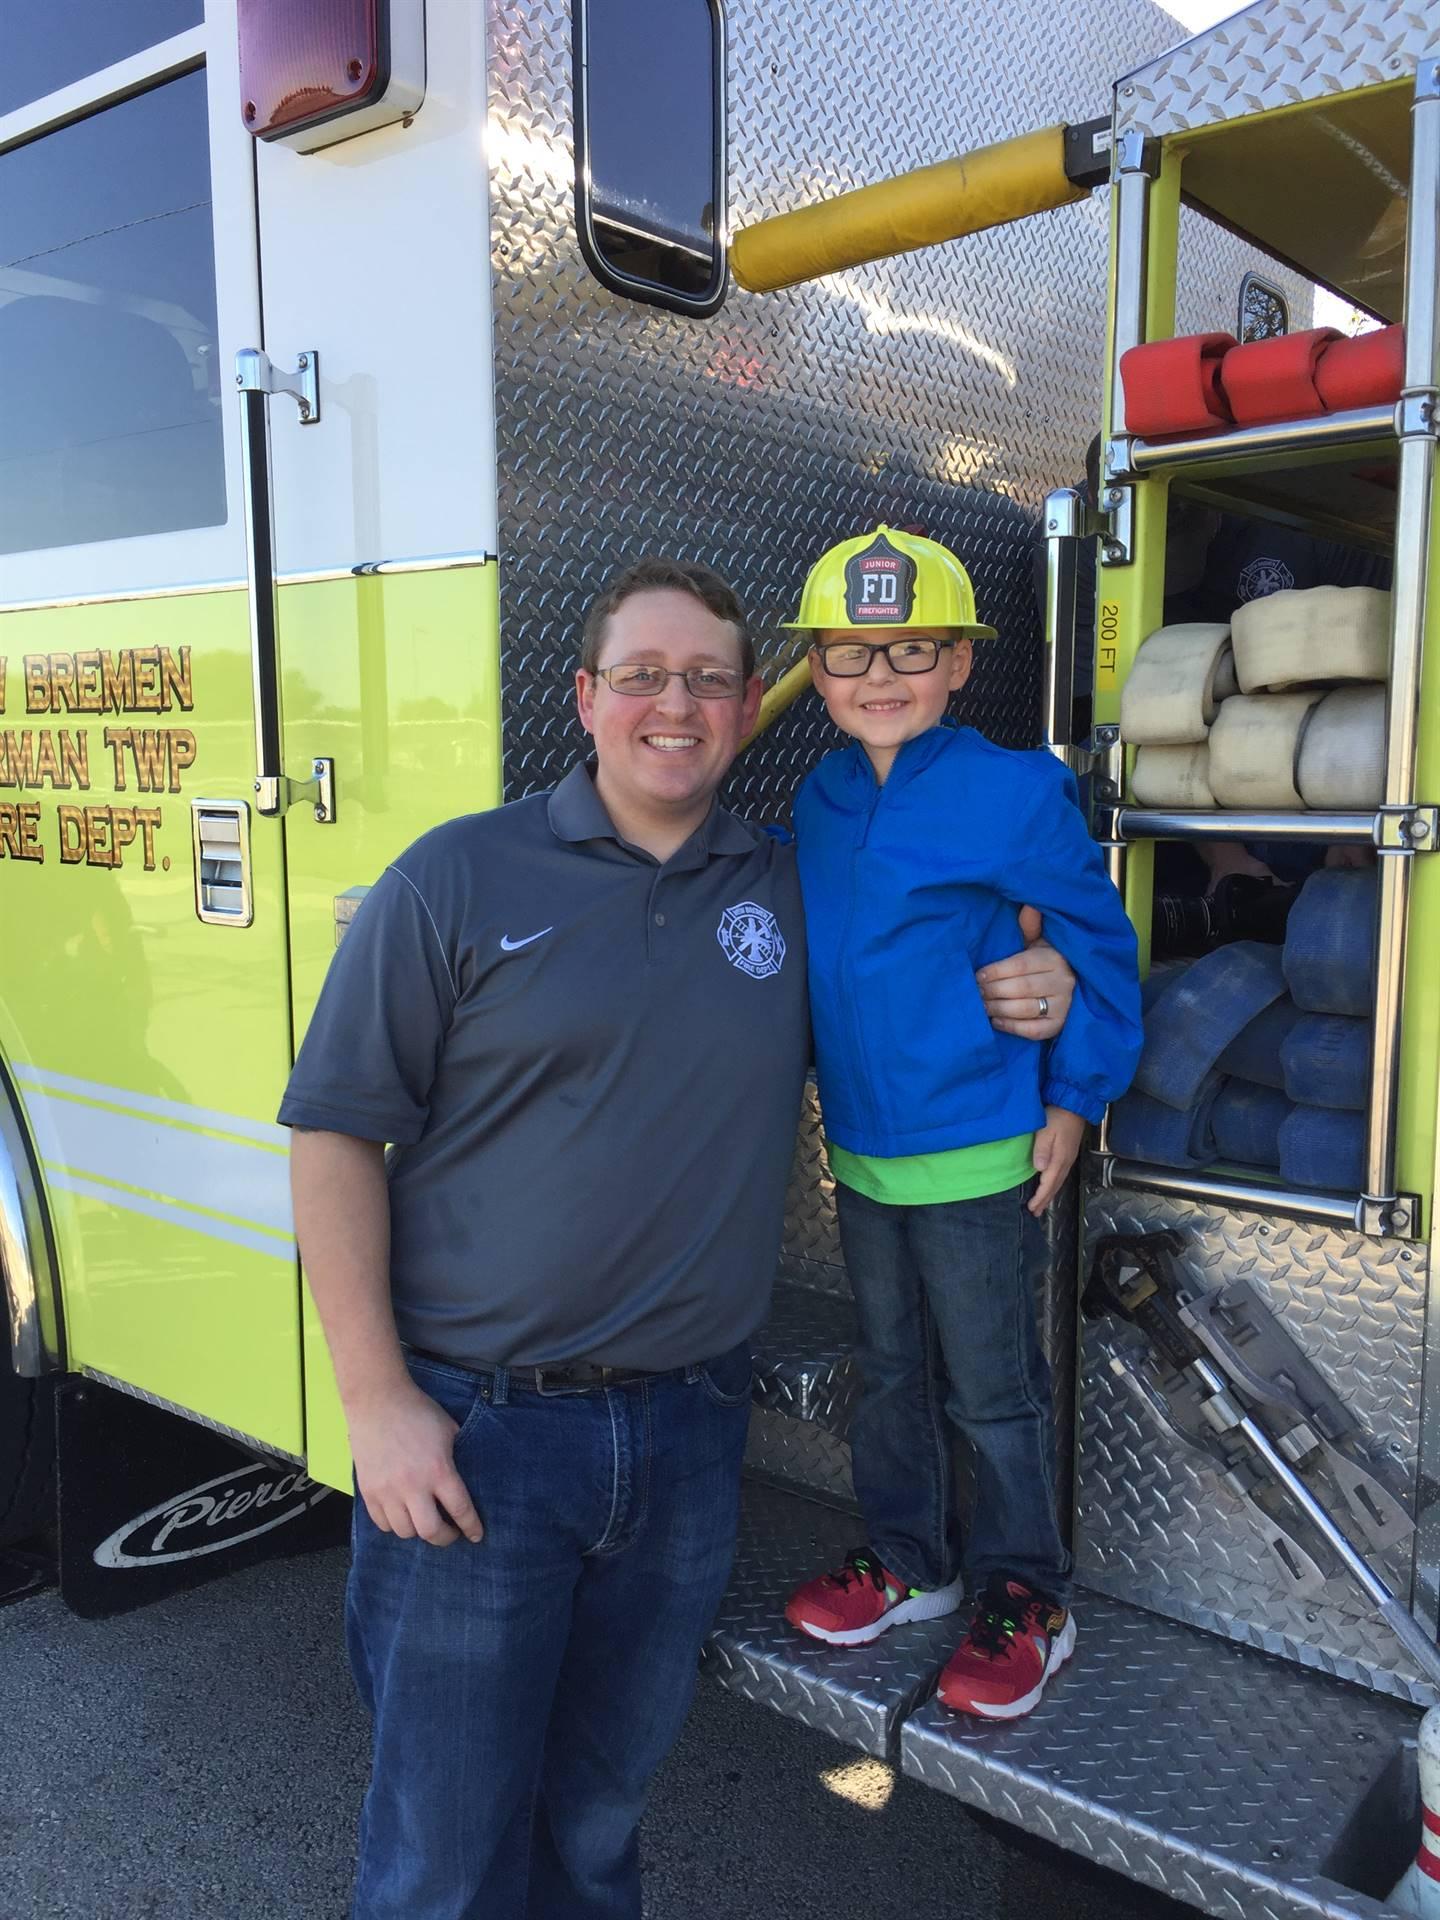 future firefighter!